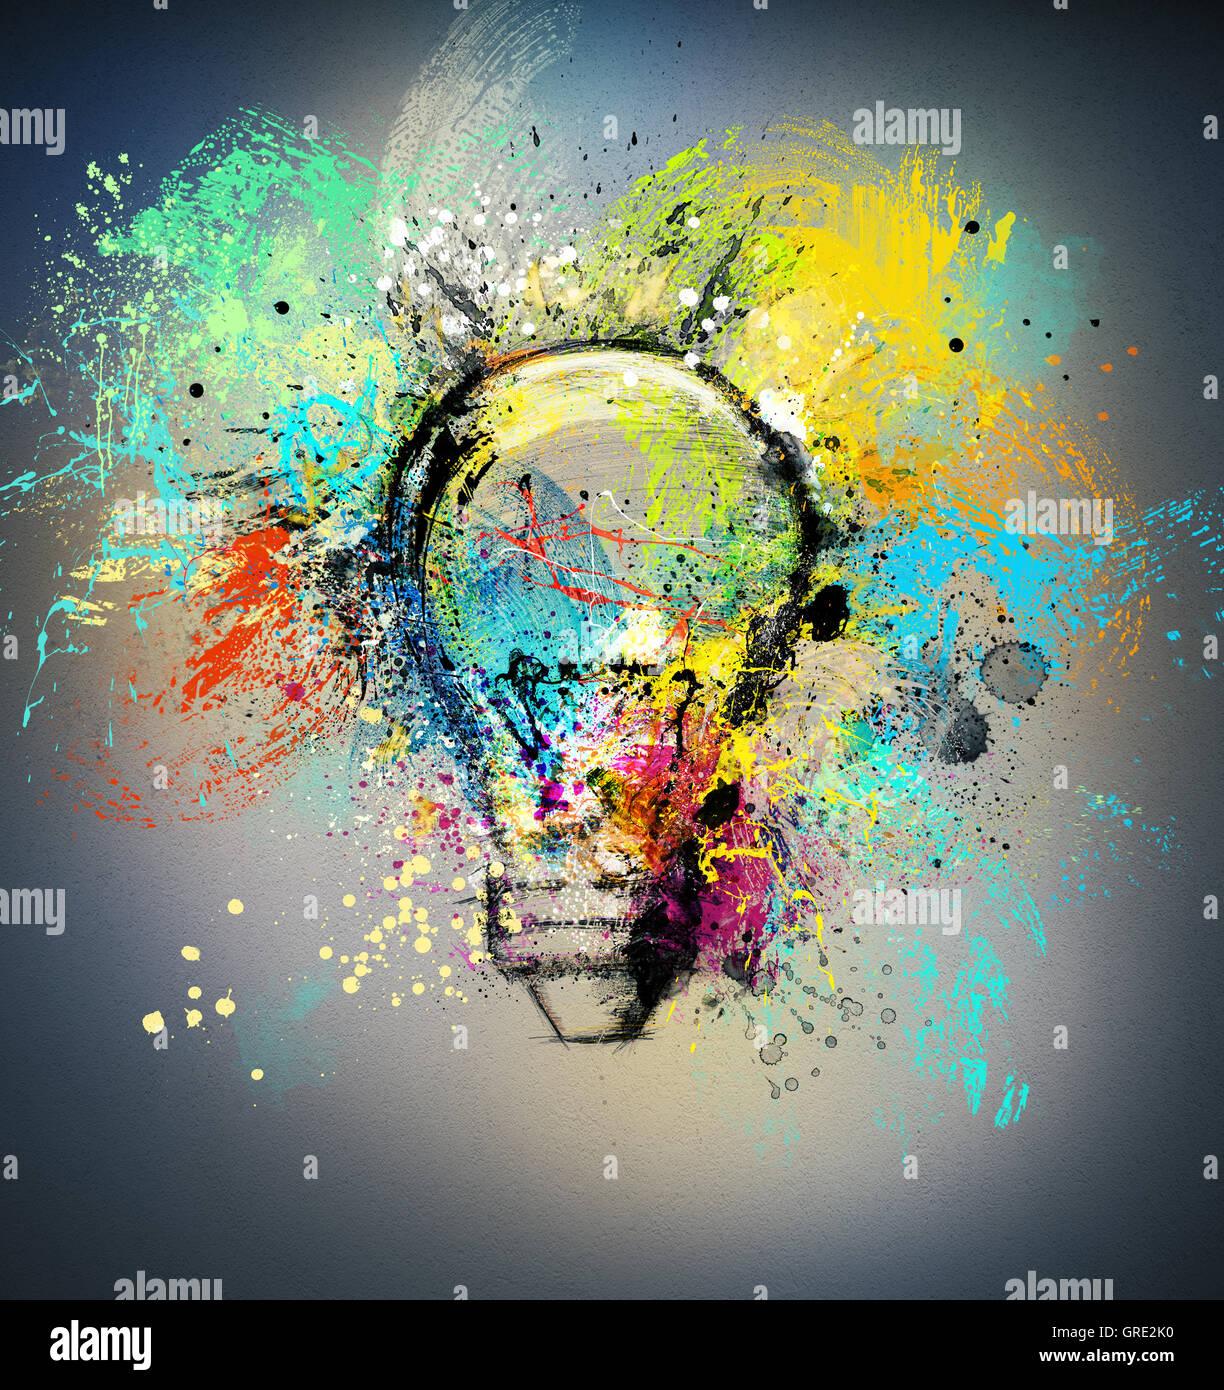 Nueva idea creativa Imagen De Stock